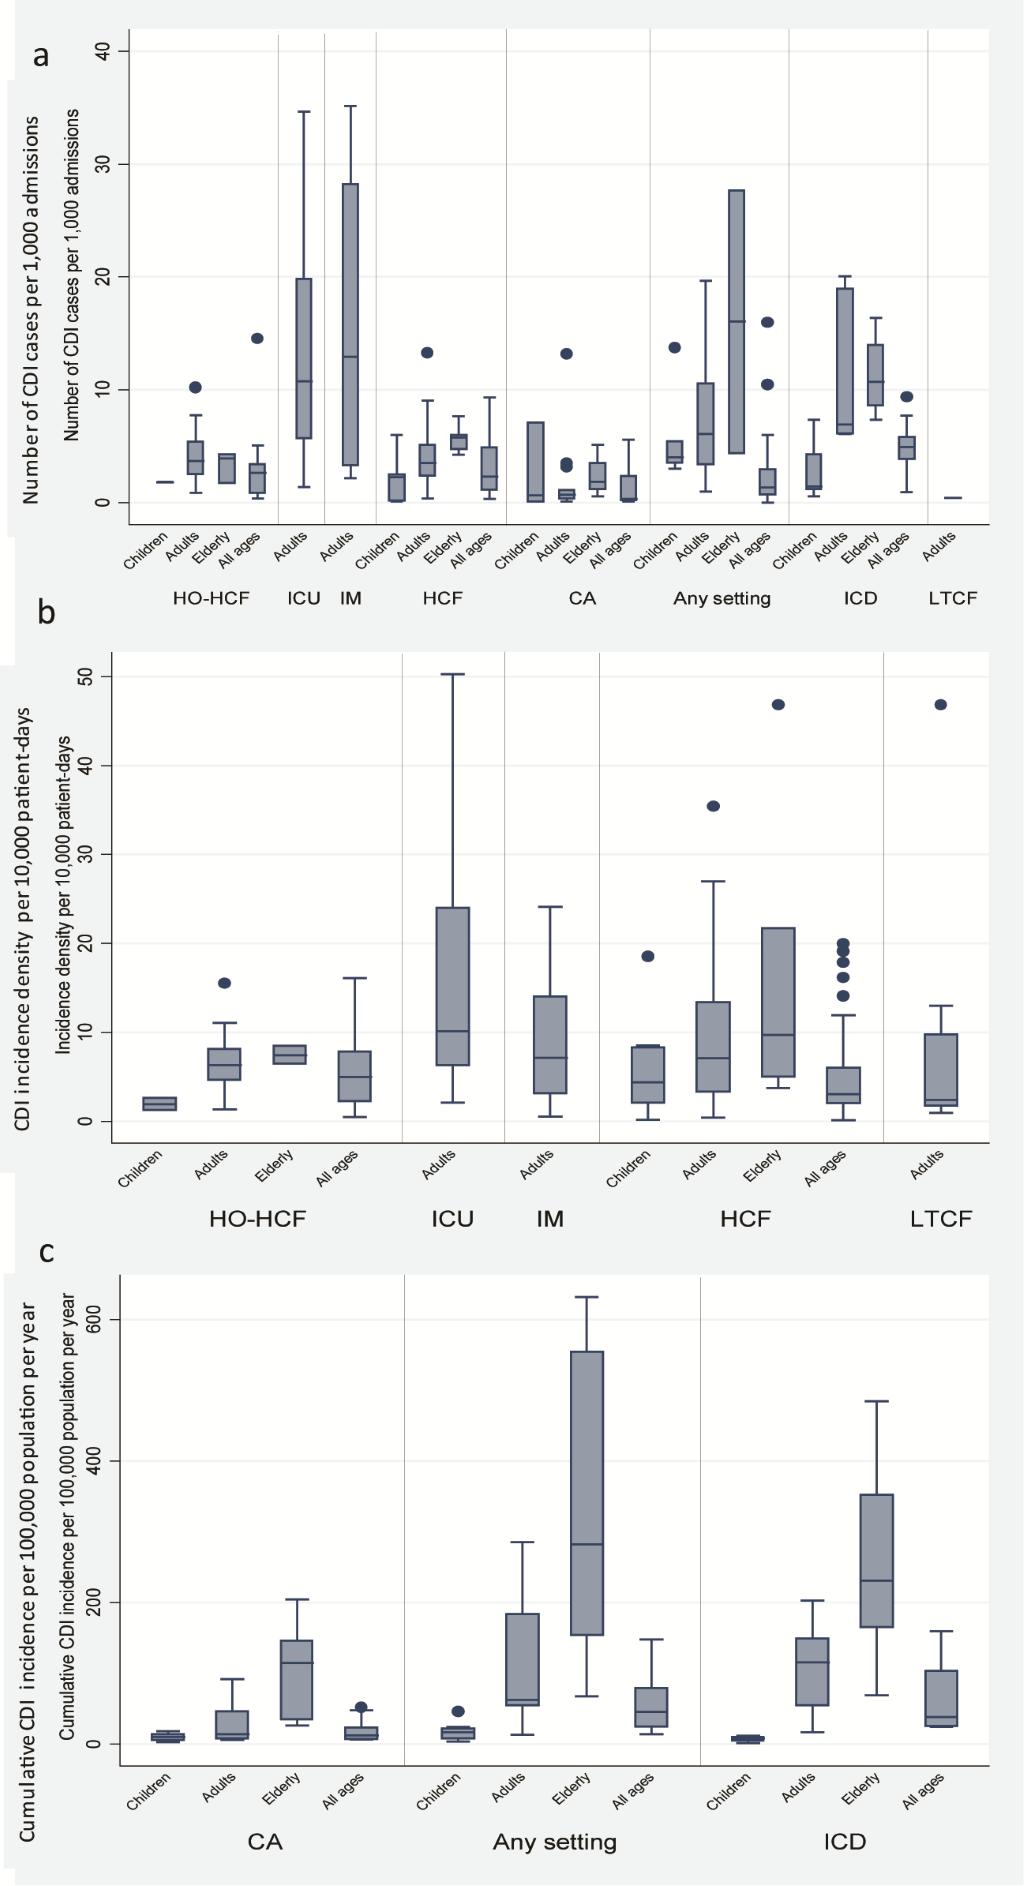 Global burden of Clostridium difficile infections: a